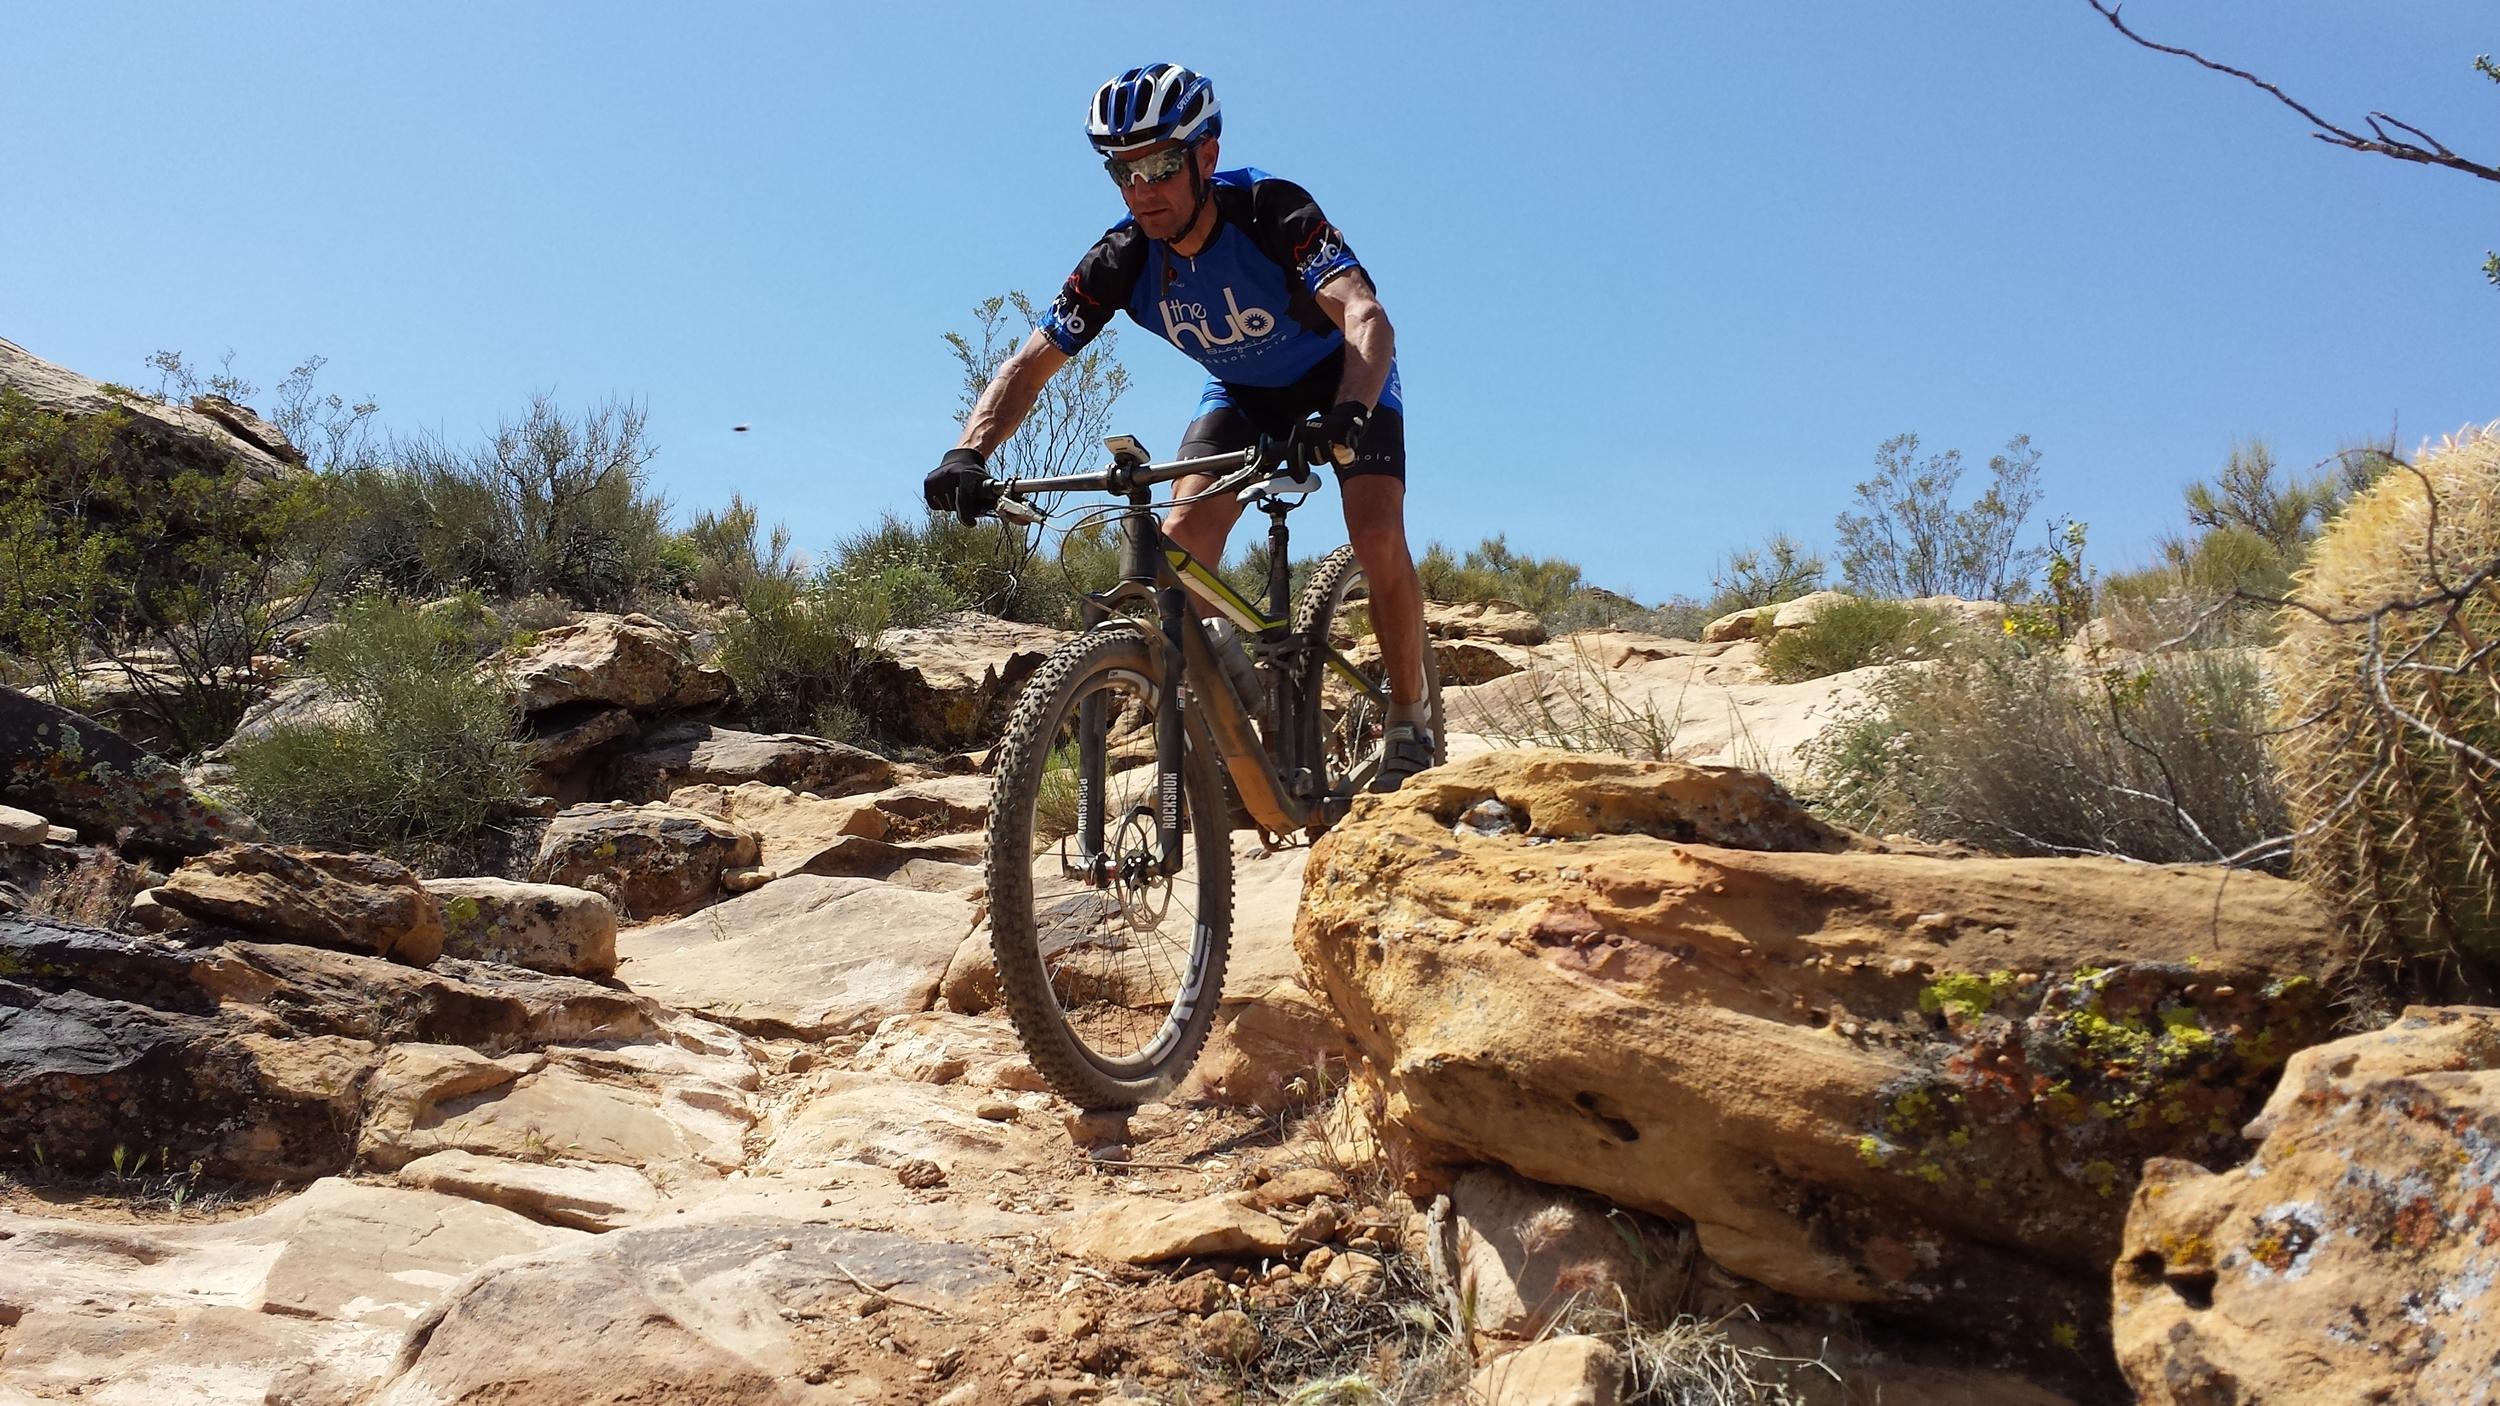 Cary enjoying the descending on his new BMC Trailfox.